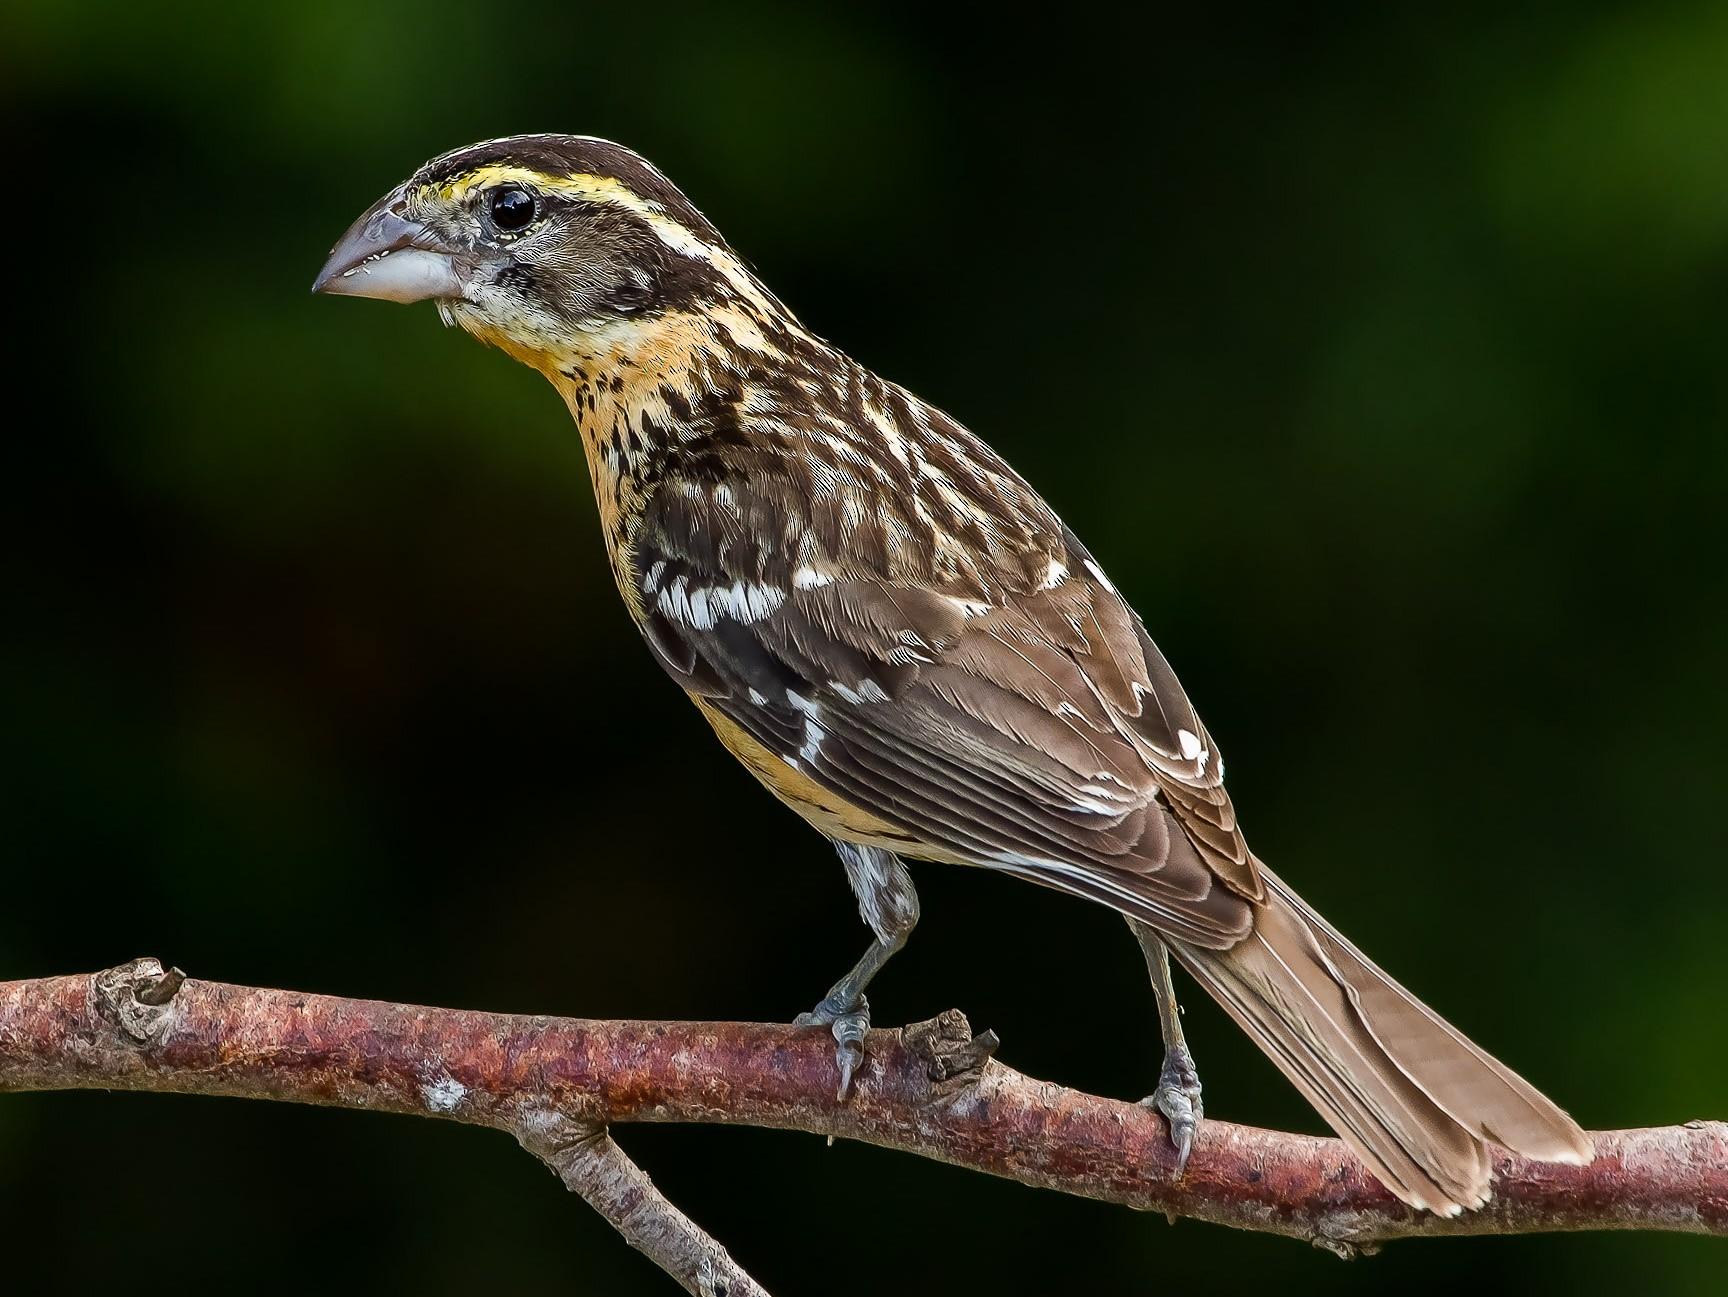 Black-headed Grosbeak - Eric Ellingson